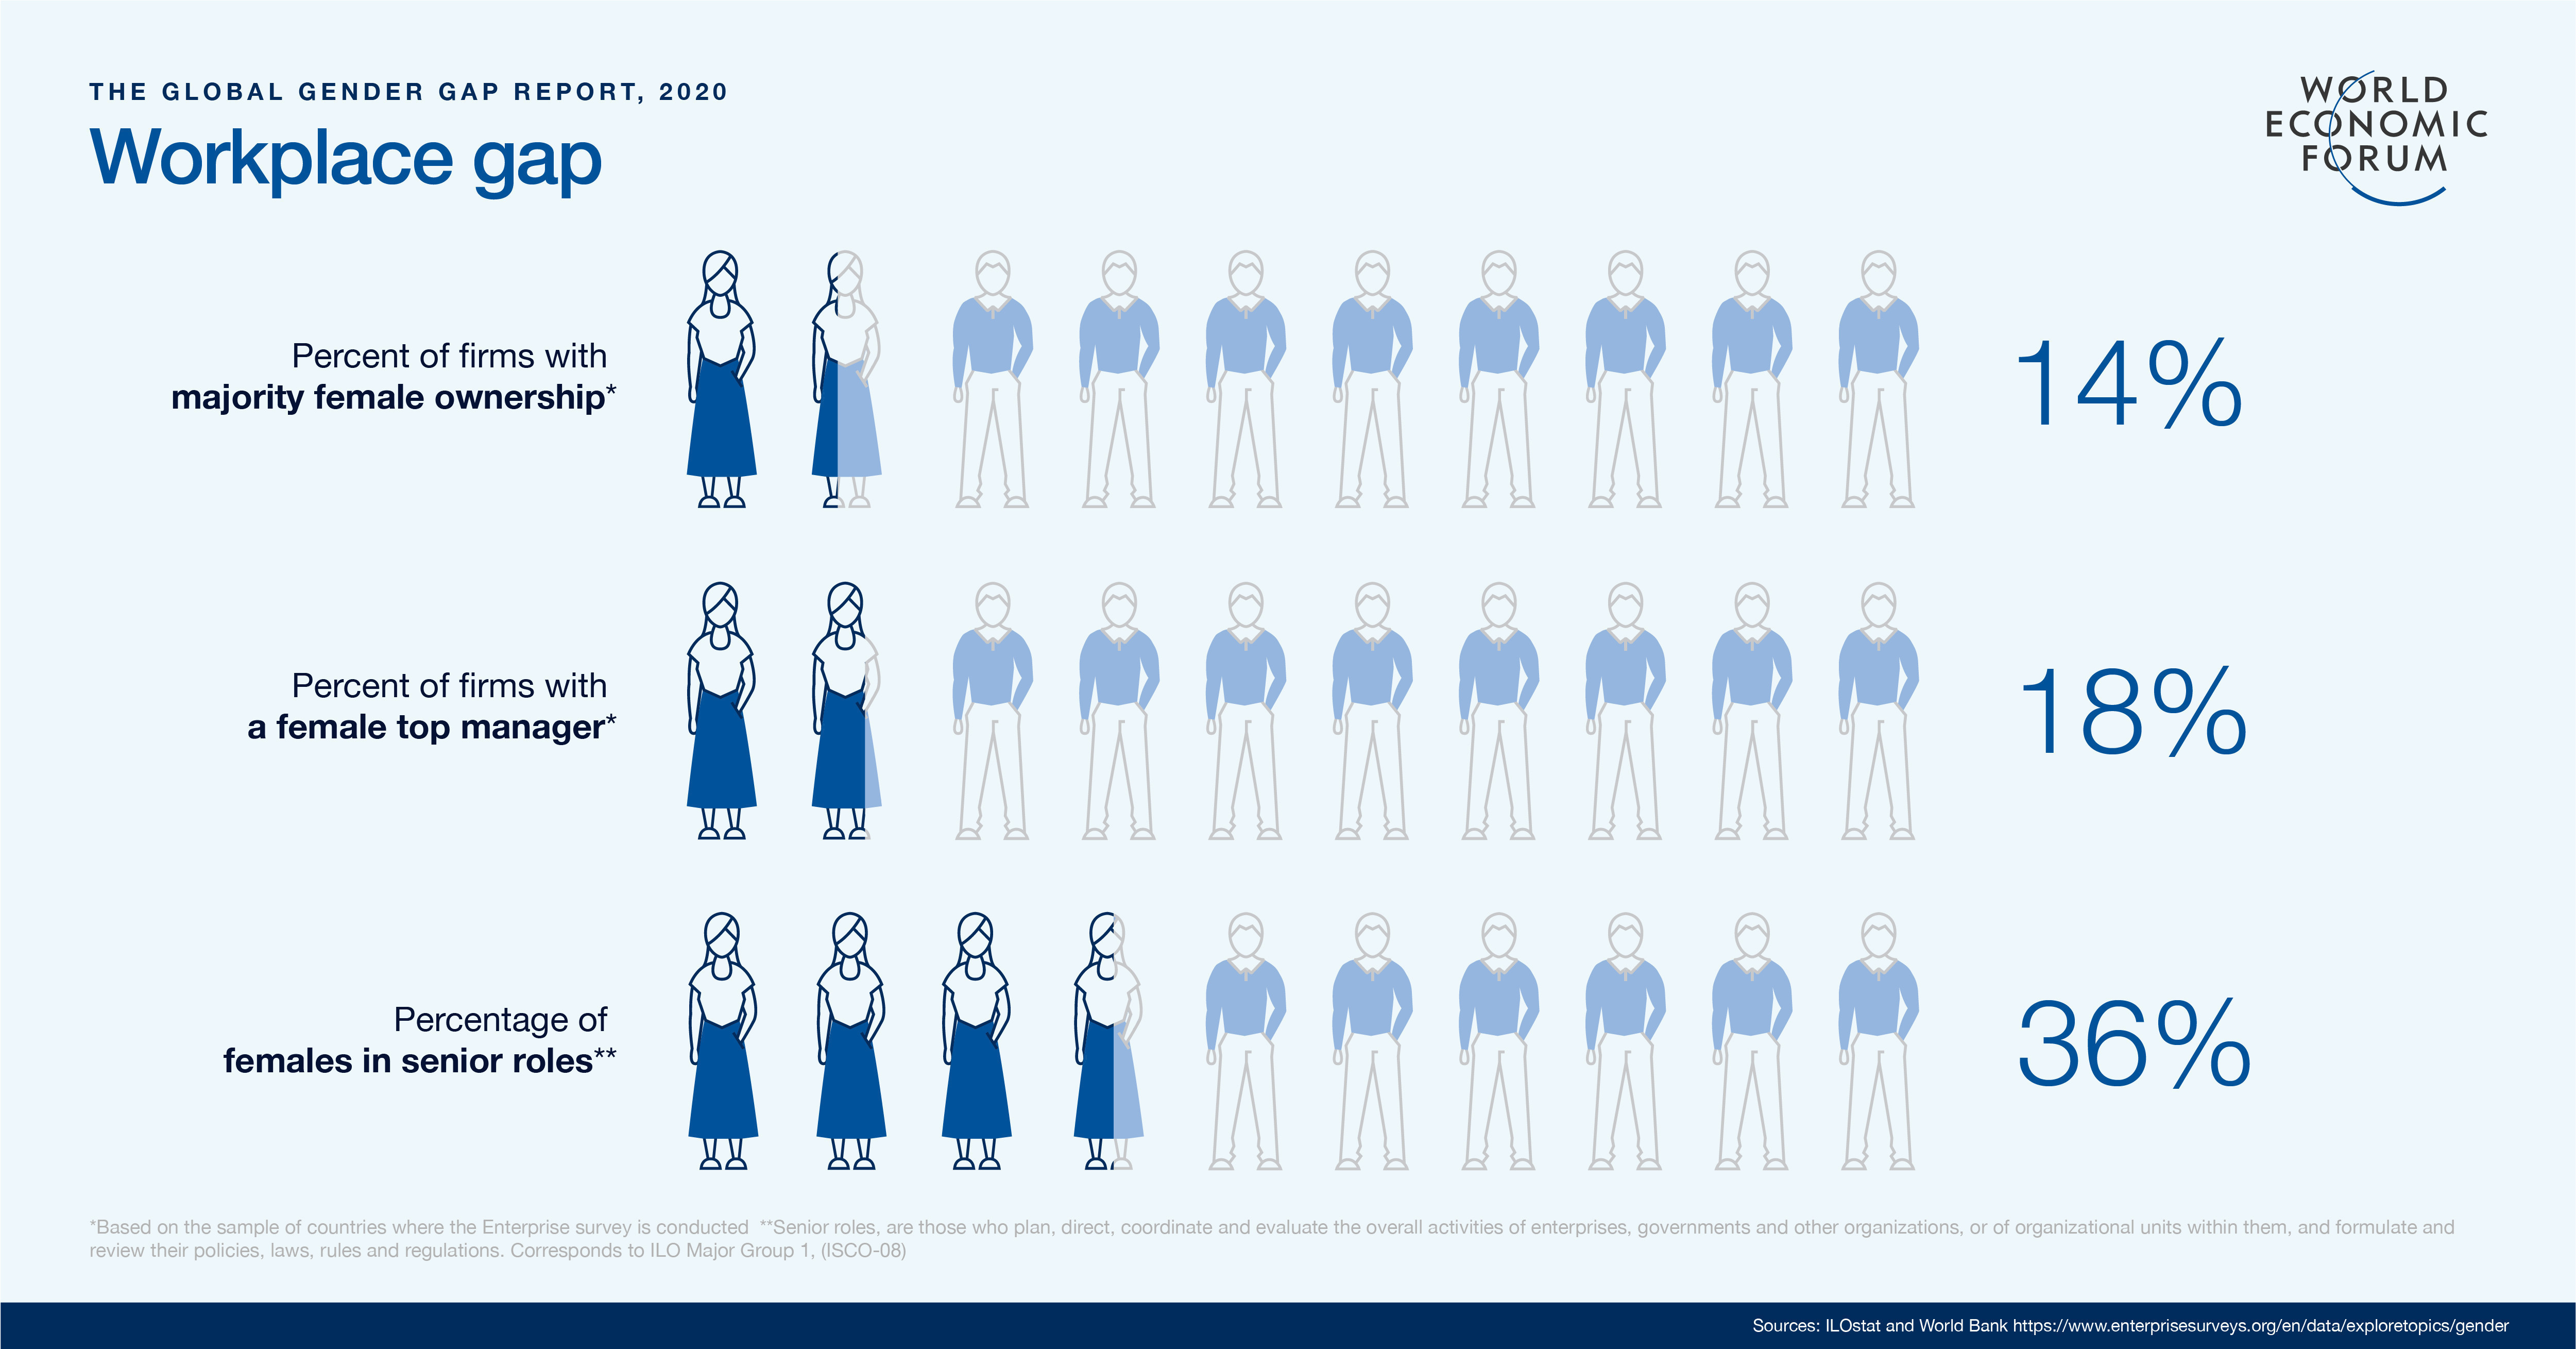 davos - The gender gap at work